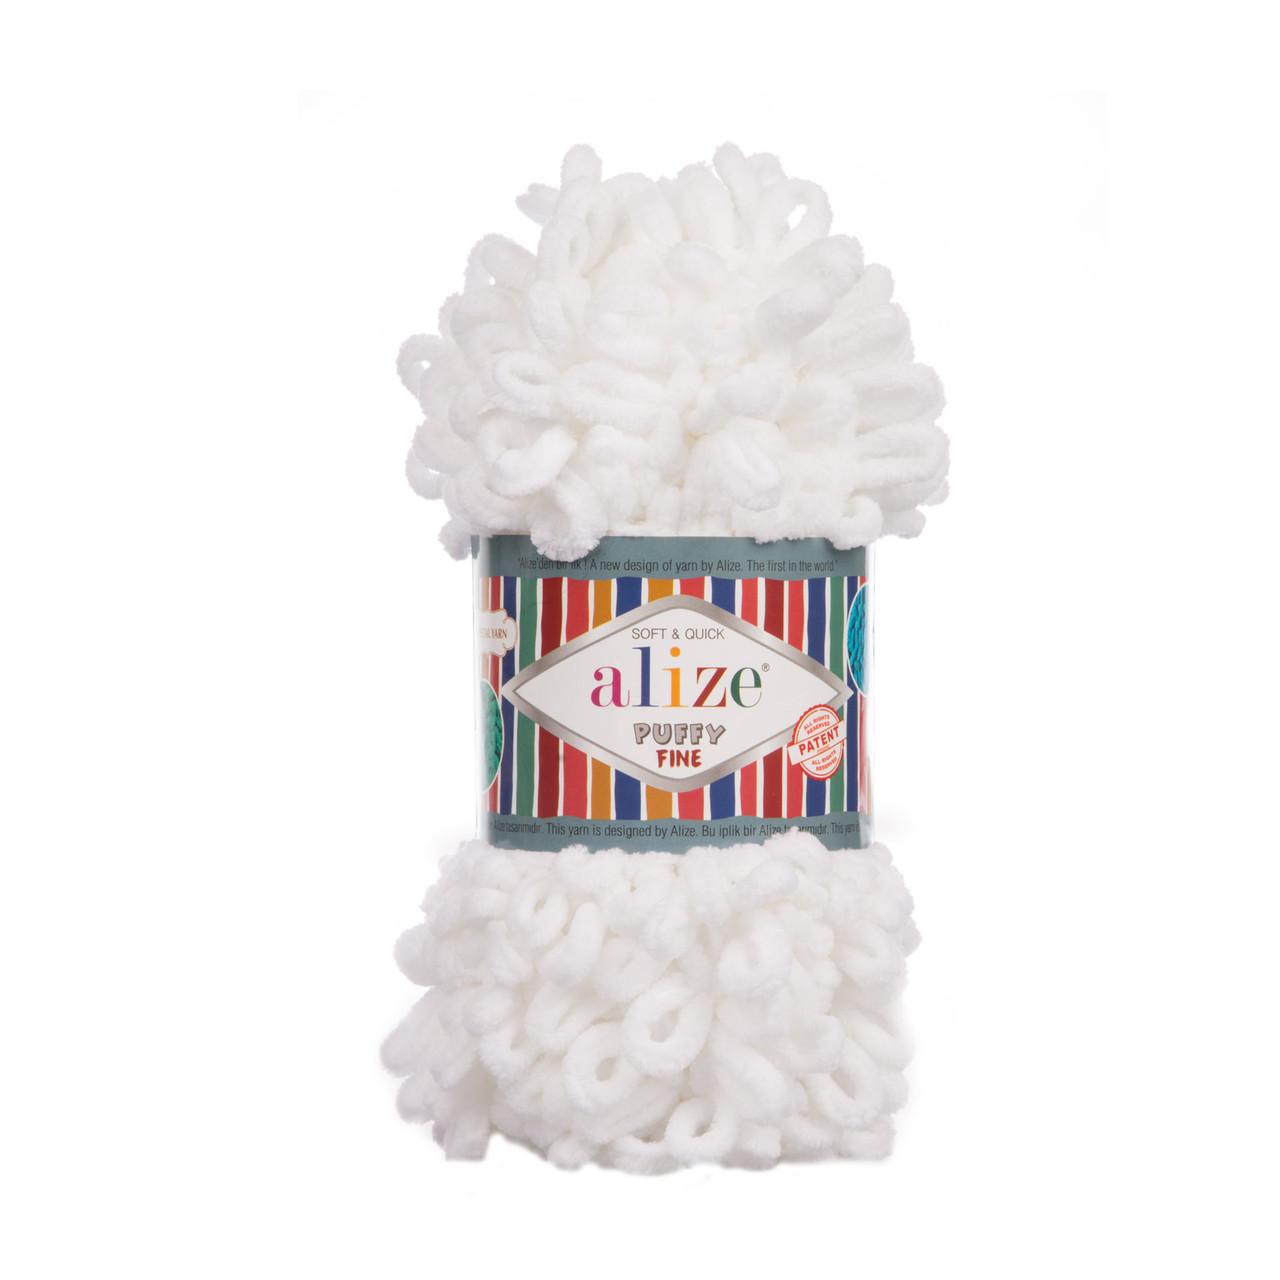 Alize Puffi Fine пуффи файн для вязания руками 55 белый цена 228